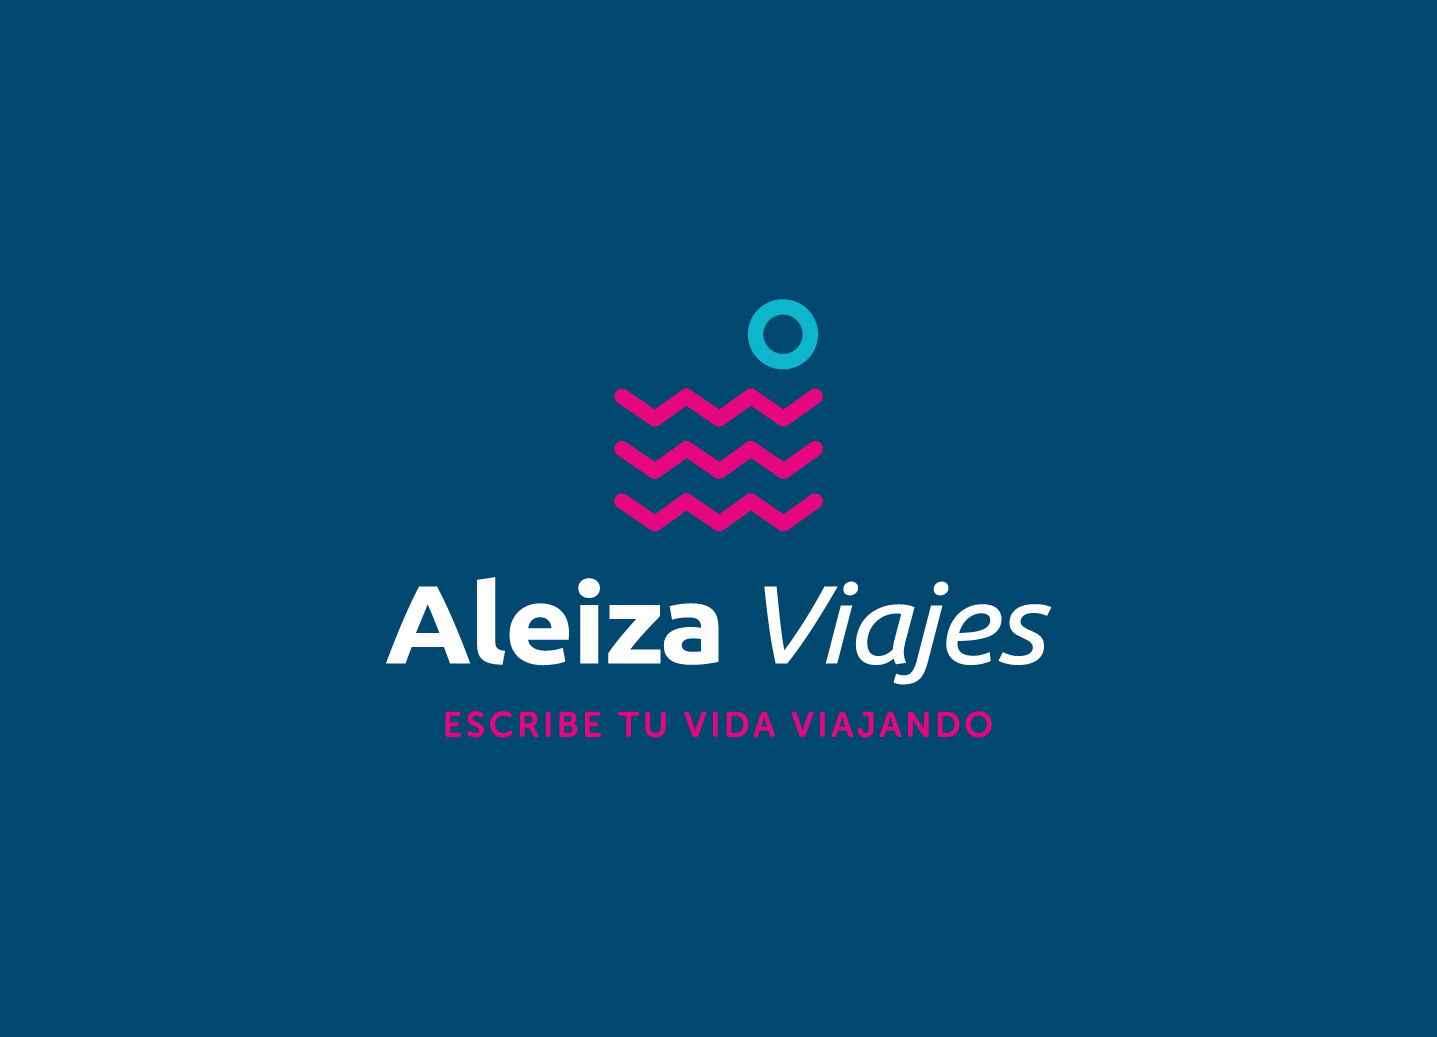 aleiza-viajes4